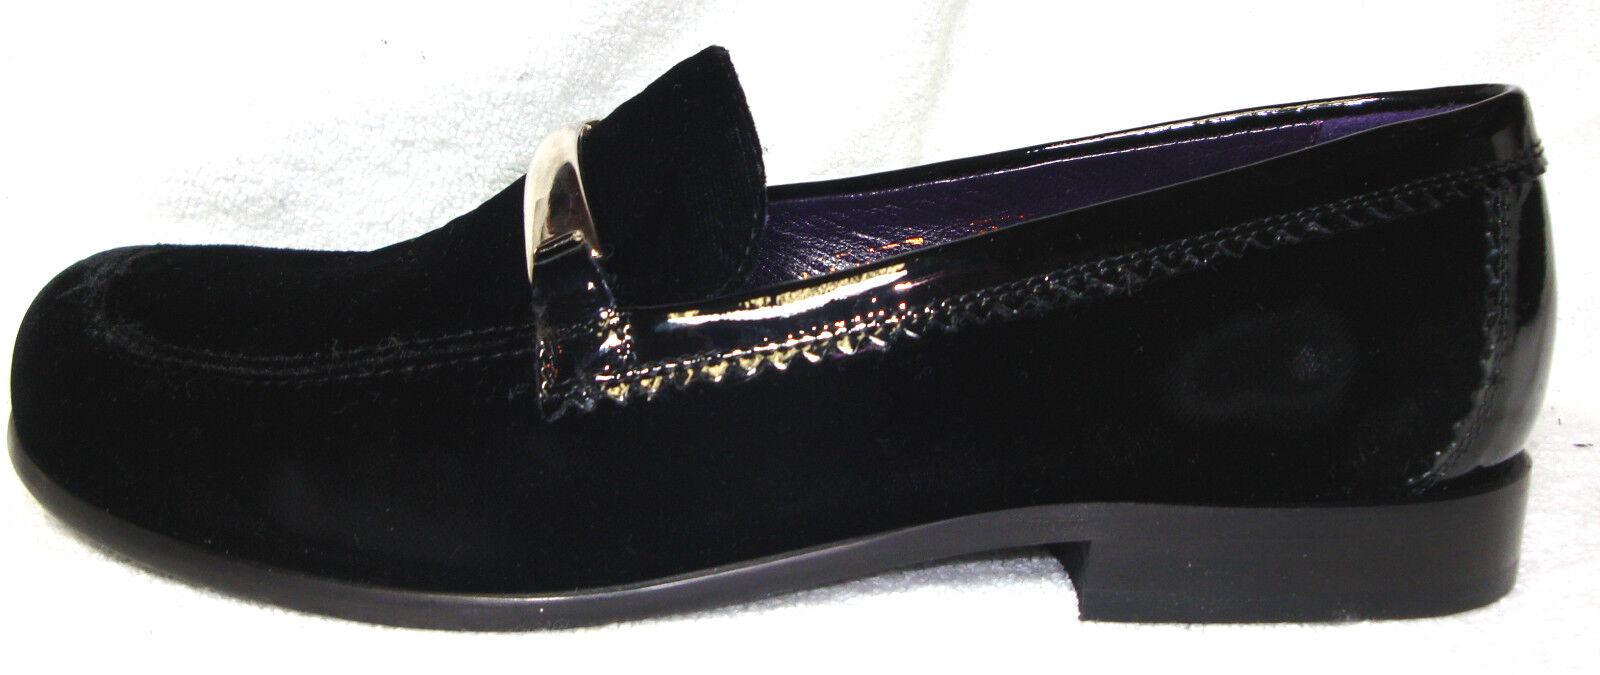 DonaldJ. Pliner Black Velvet/Patent Leather Loafers/Shoe Silver Strap Flat Loafers/Shoe Leather 8.5M c1ca7c